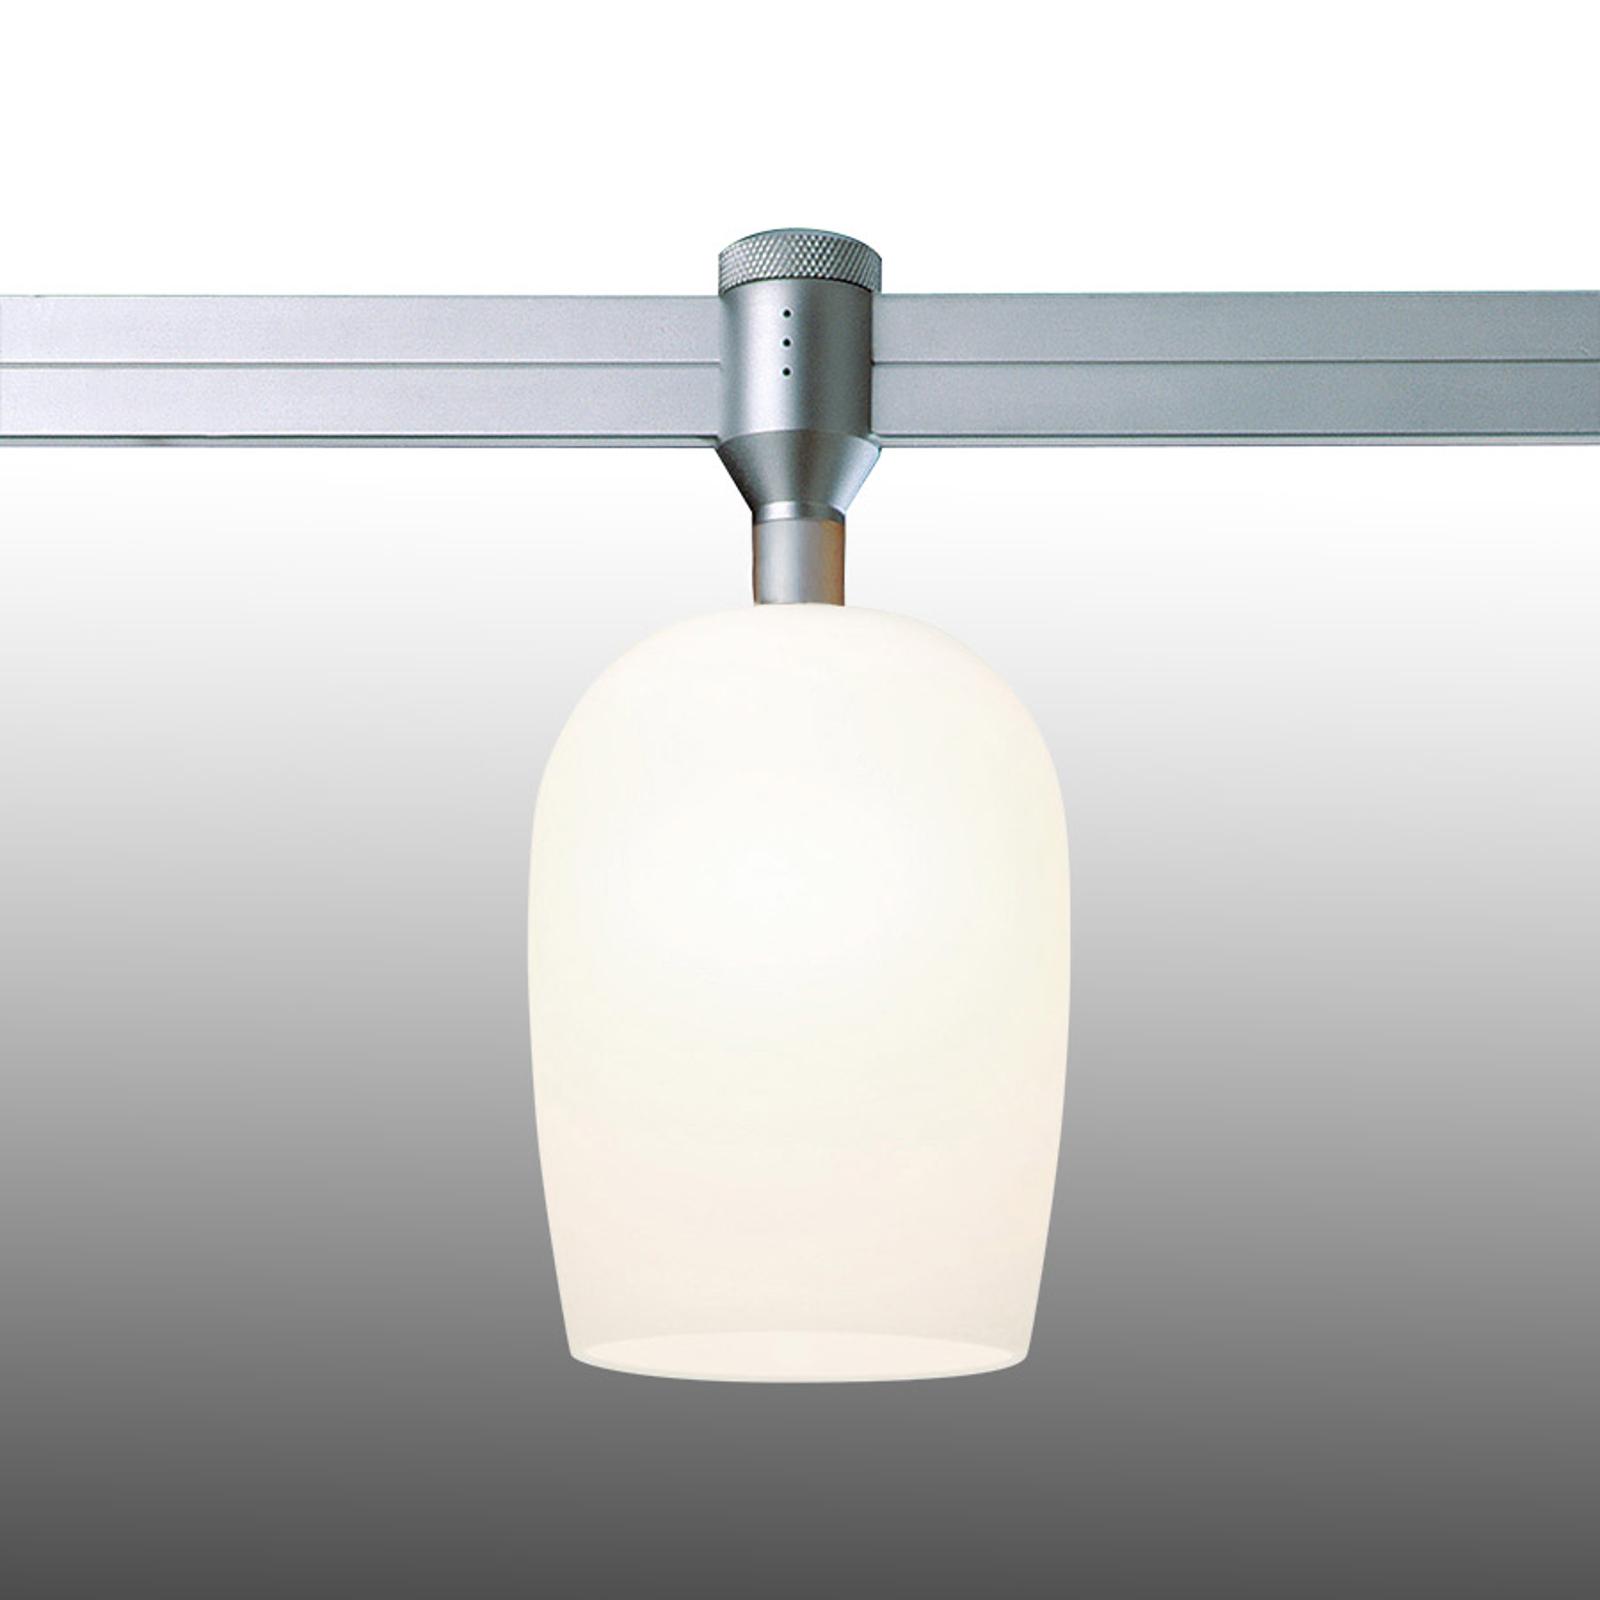 Lampada Balibu per binari CHECK-IN, bianca